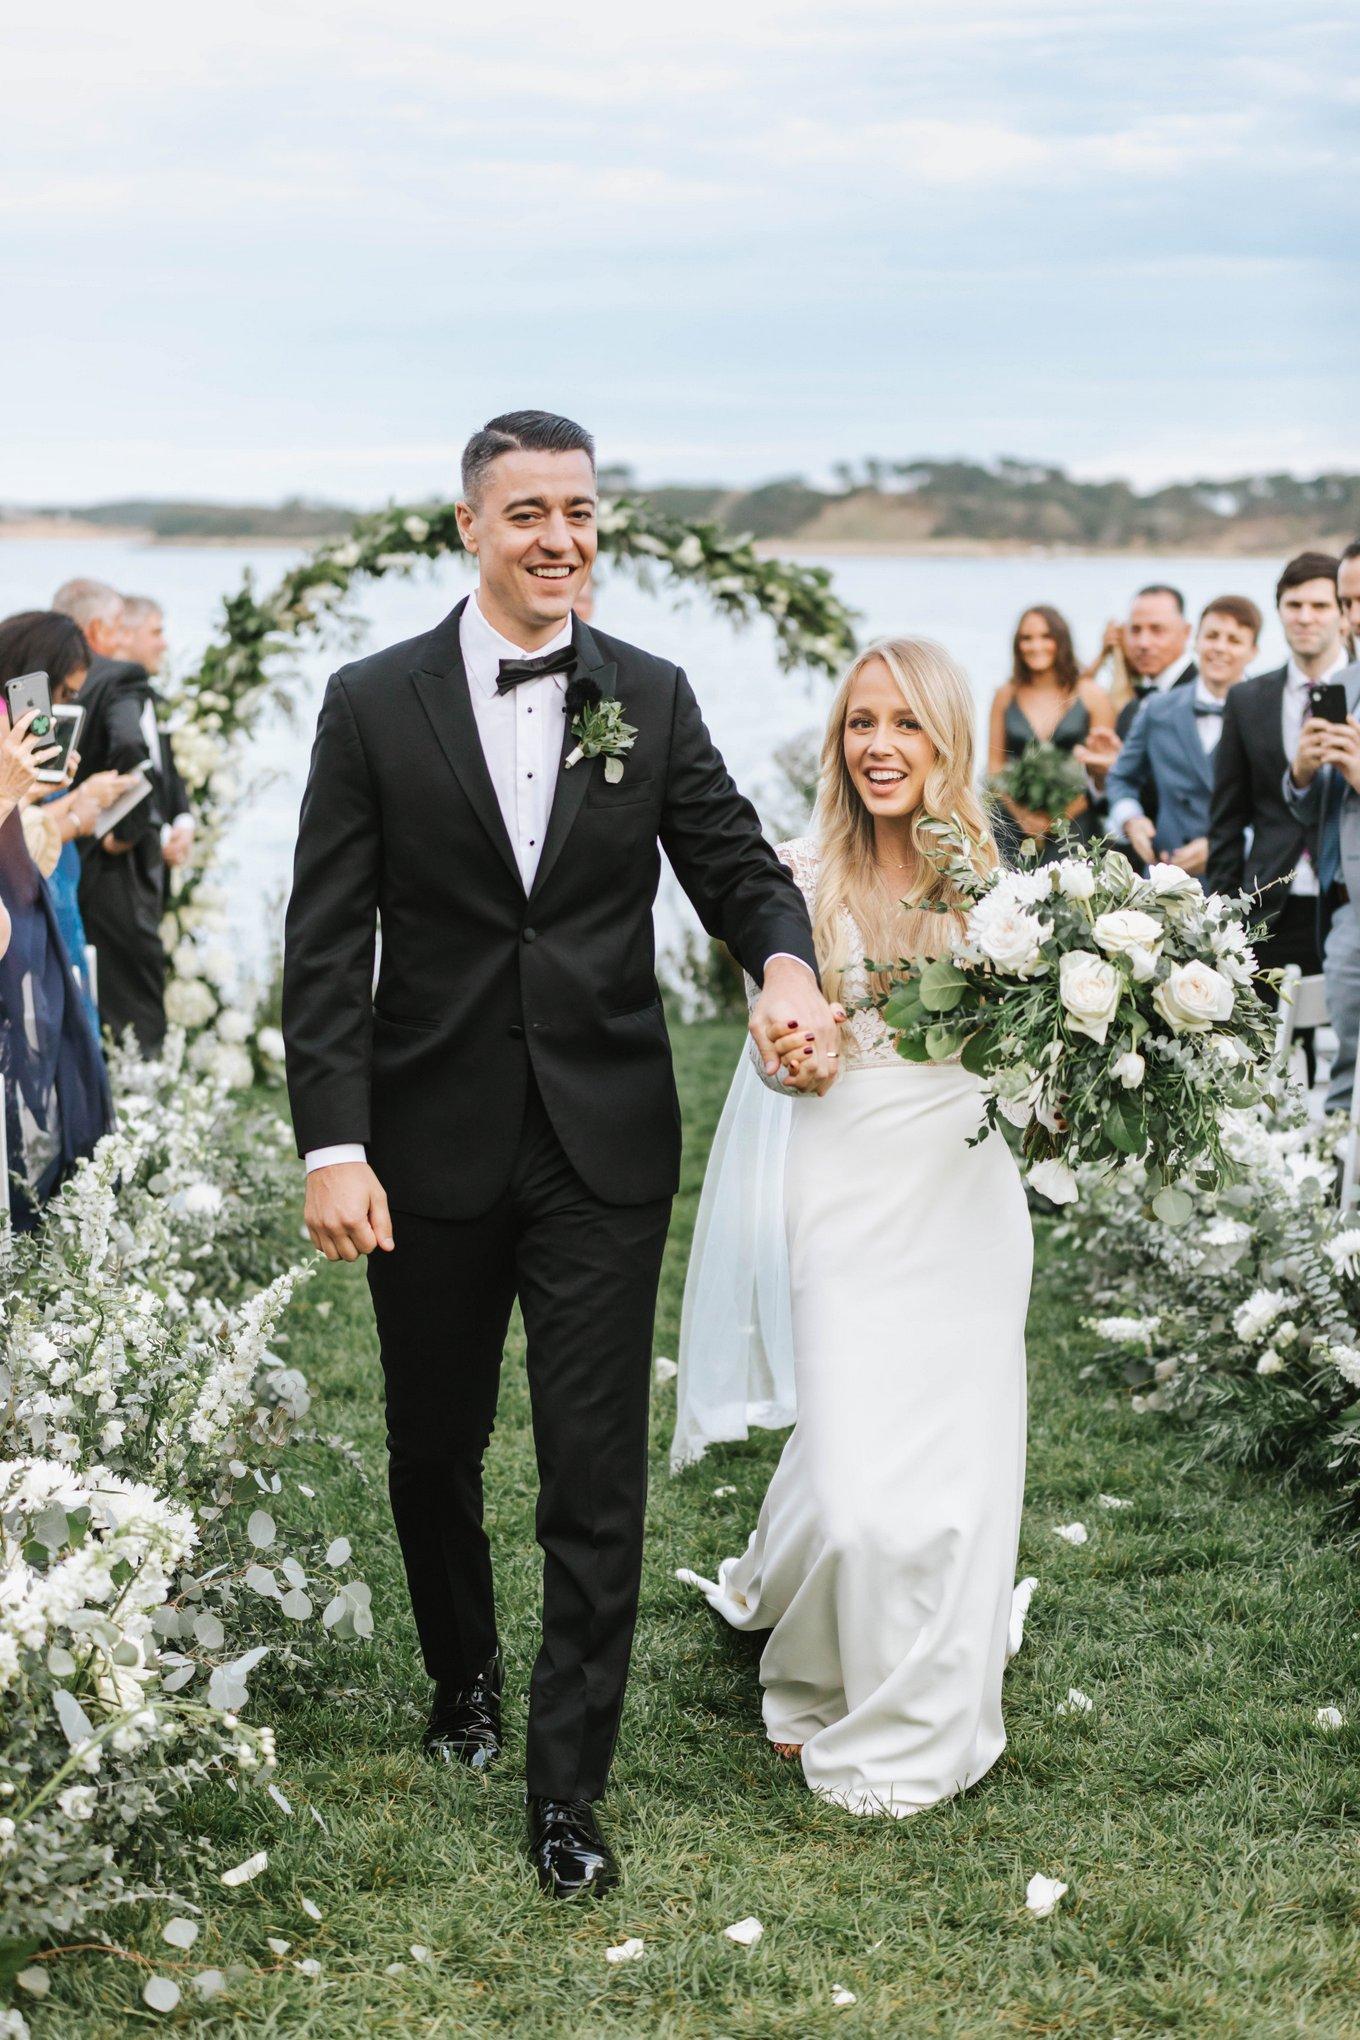 Wequassett-Wedding-Photographer-Cape-Cod-Boston-Lena-Mirisola-33.jpg